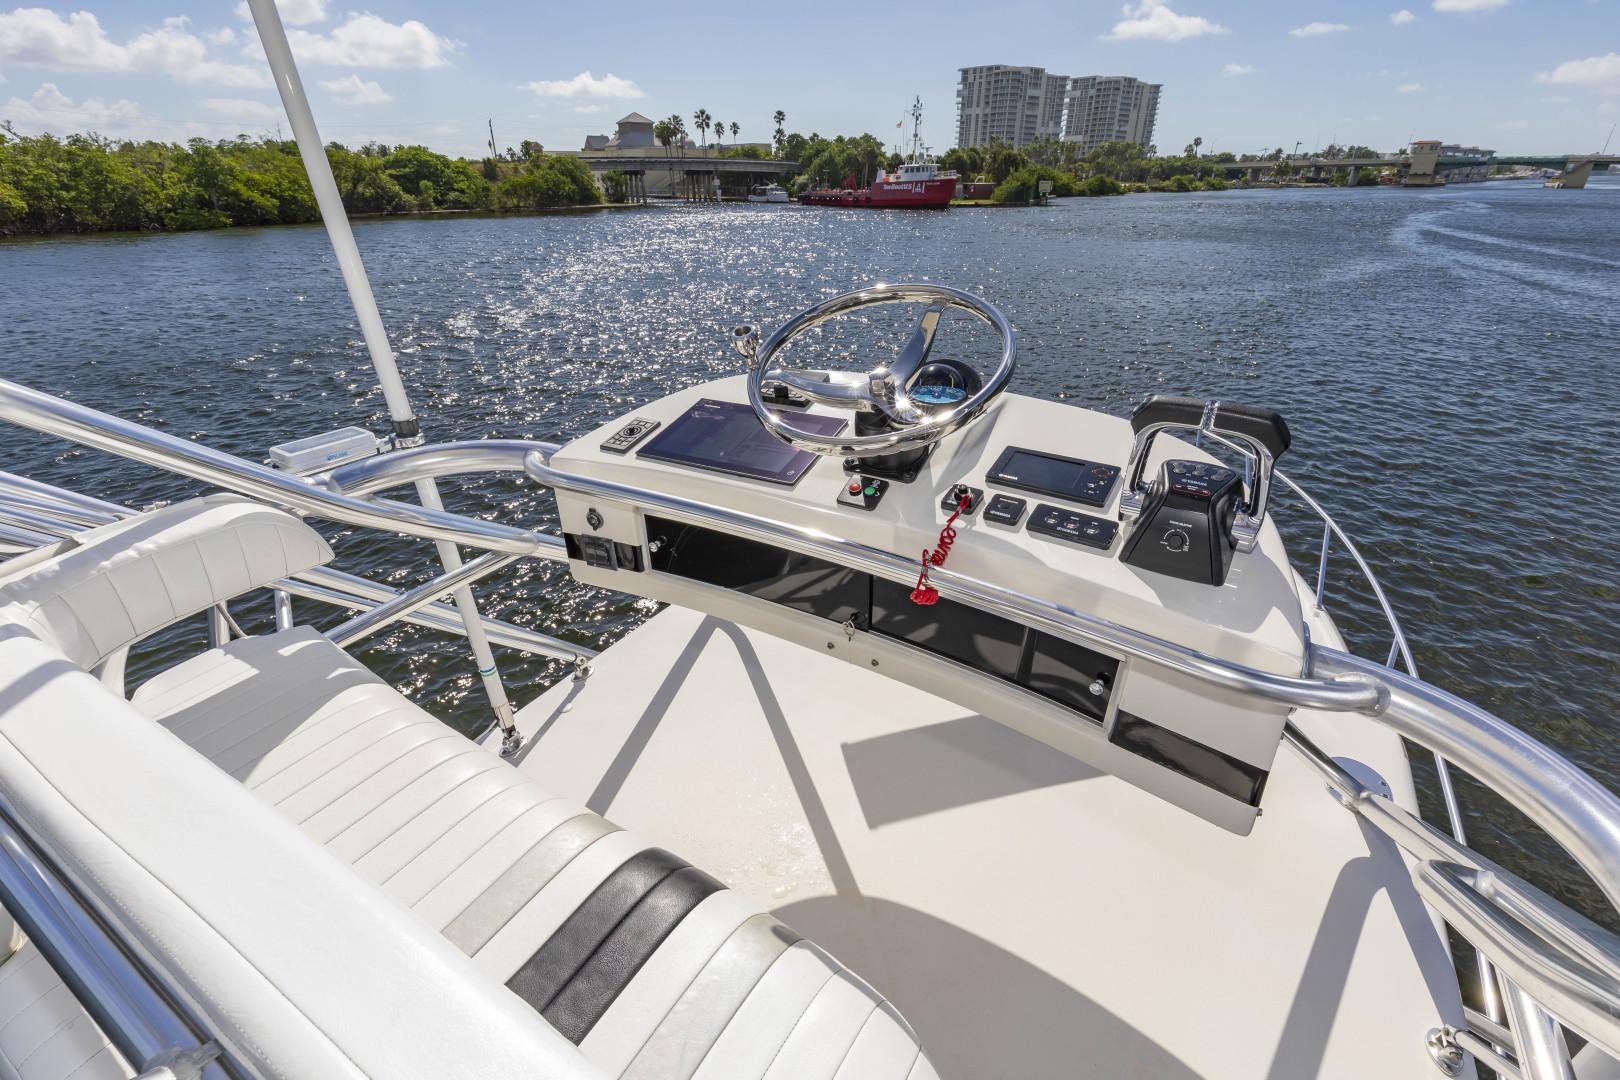 Intrepid-377 Walkaround 2005-Rock Boat REFIT 2018 Dania Beach-Florida-United States-377 Intrepid Tower 2-1511559 | Thumbnail